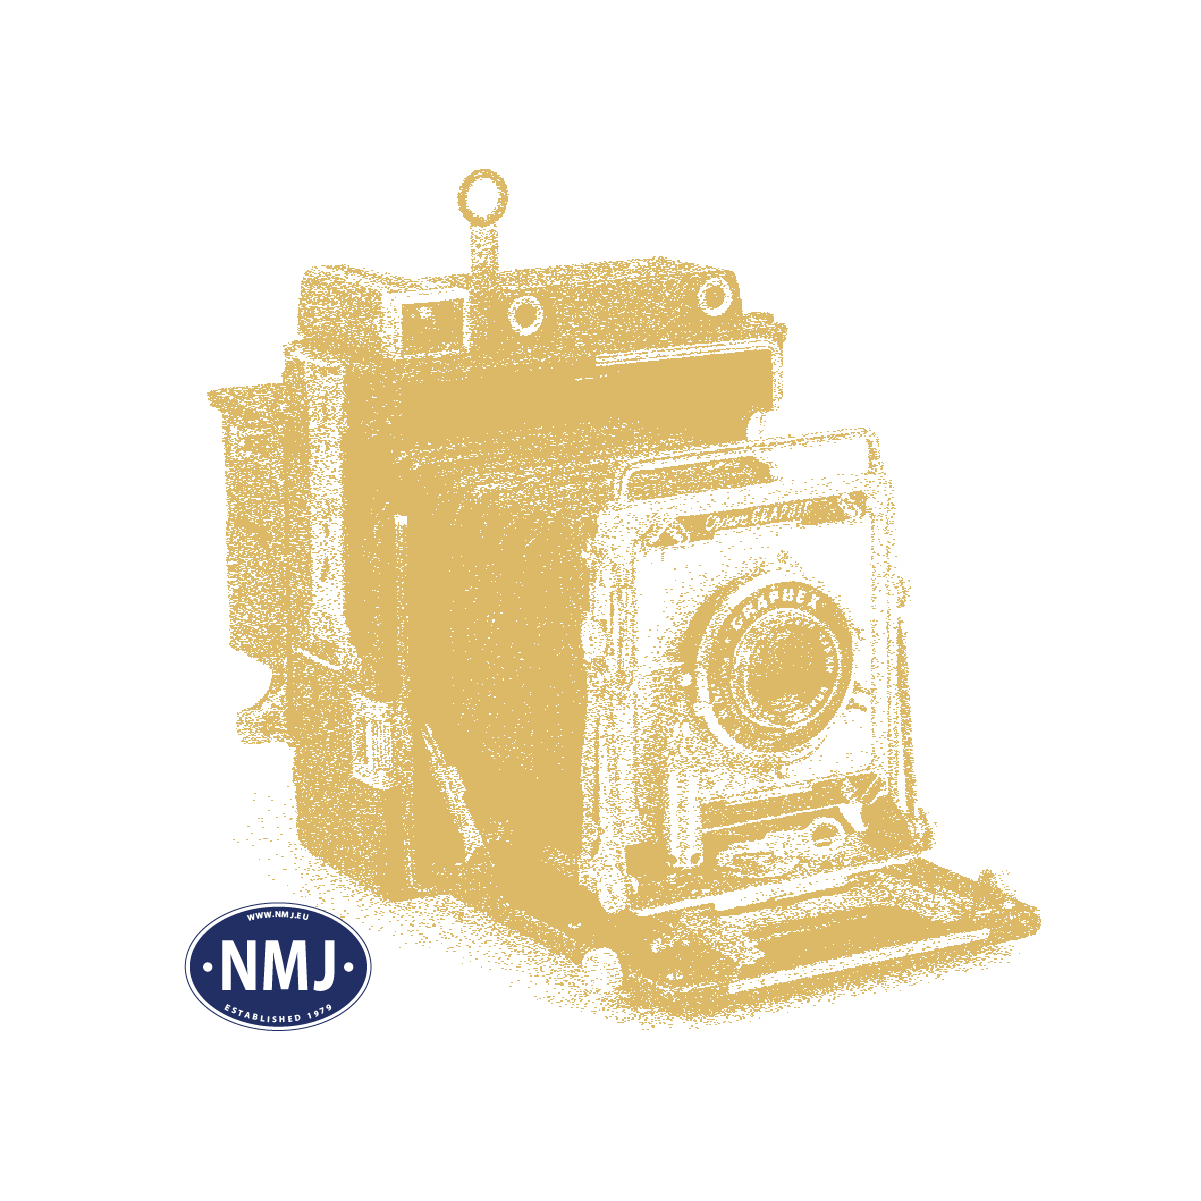 NMJT145302 - NMJ Topline CFL 1603,Spur 0, DC